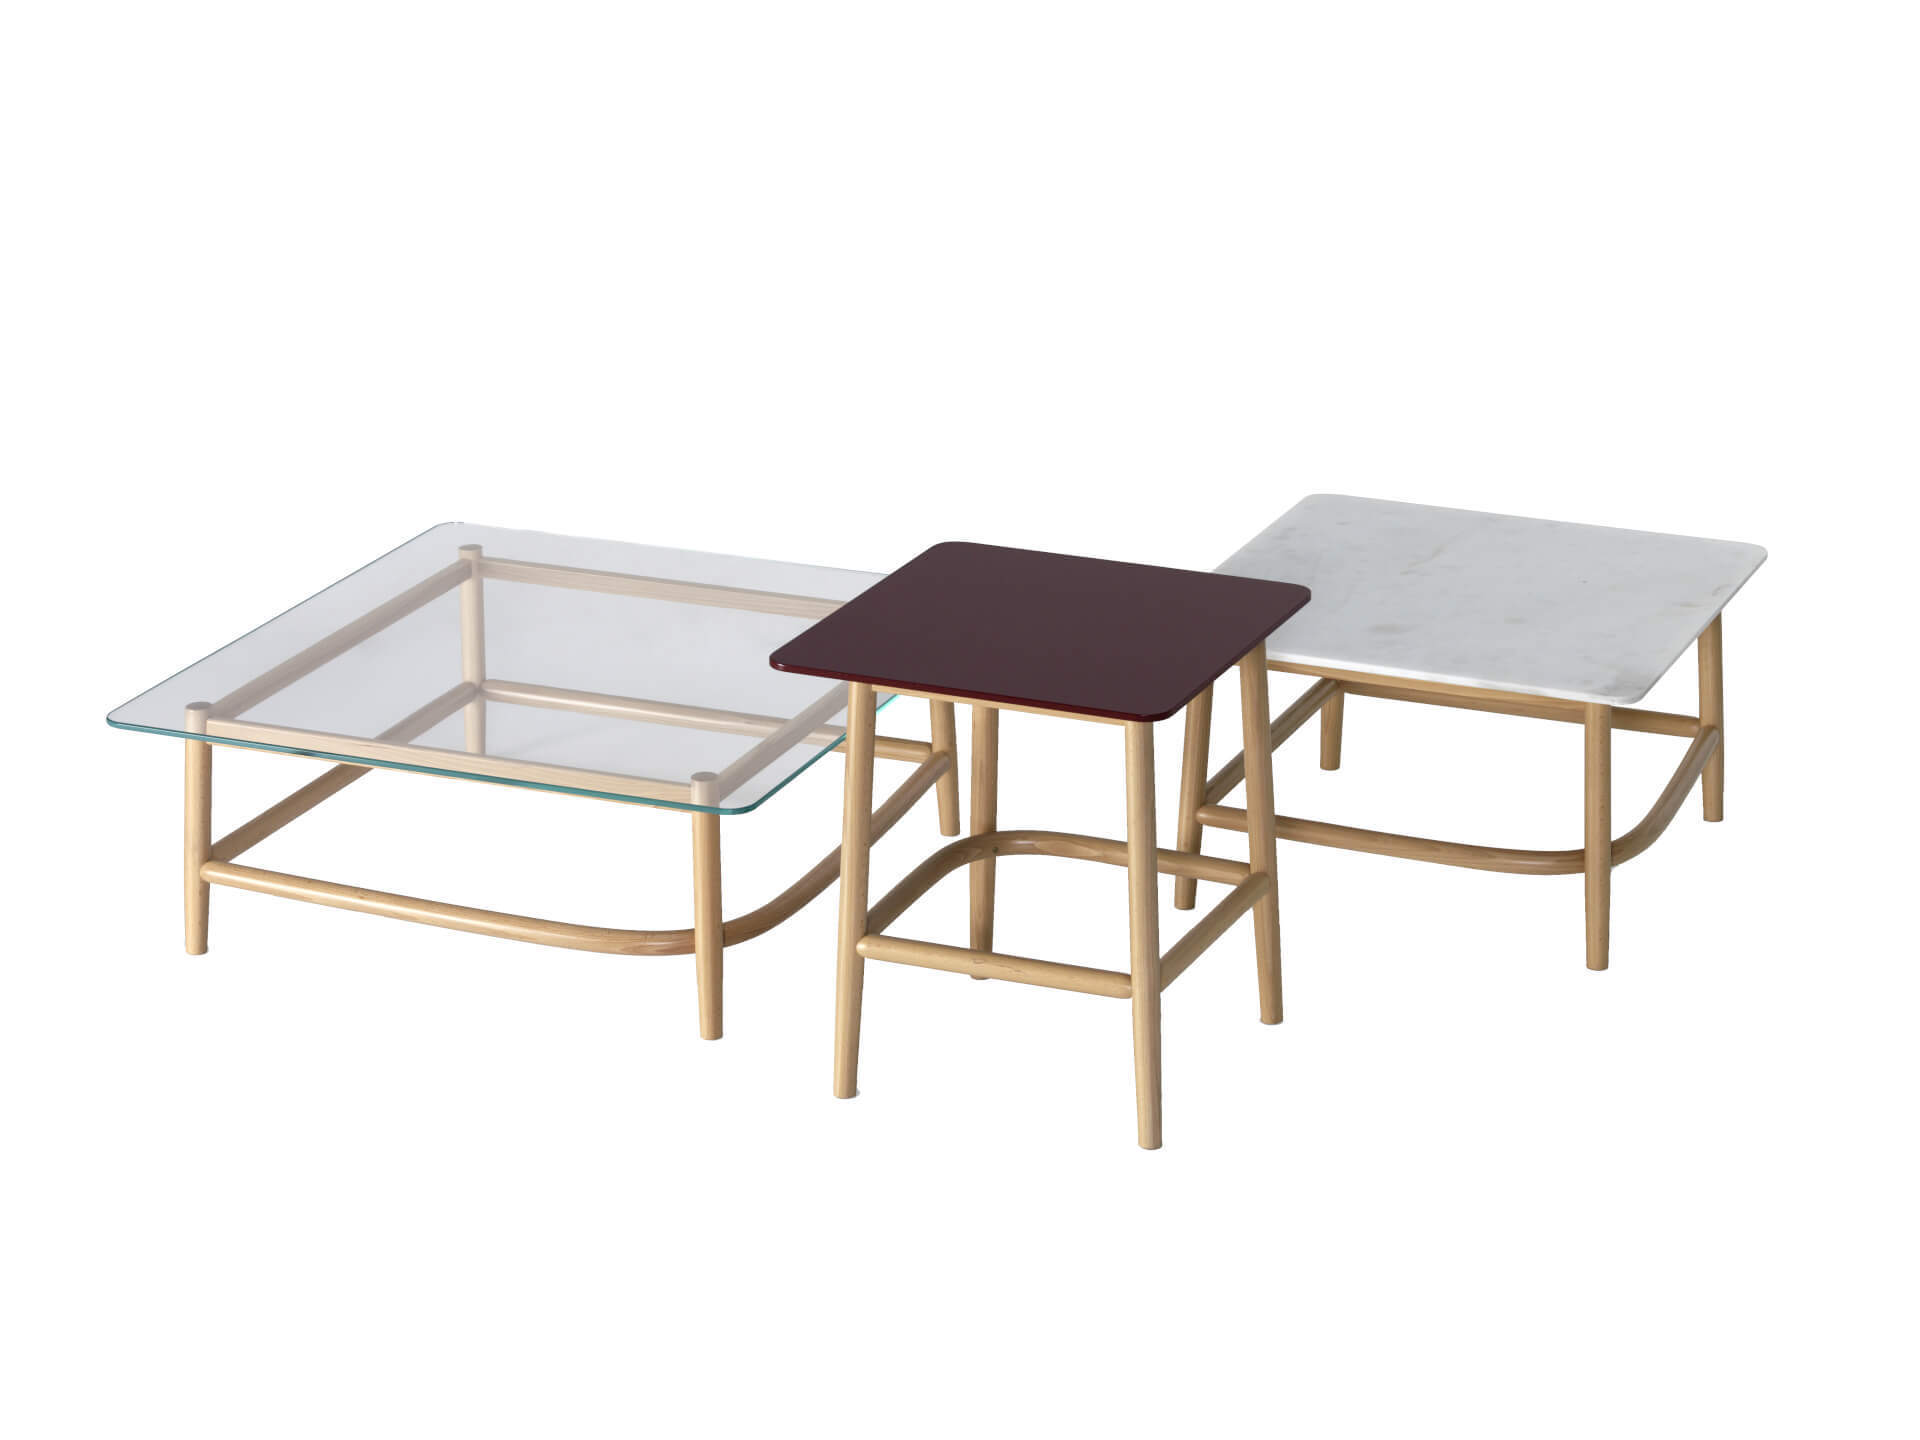 SINGLE CURVE LOW TABLES